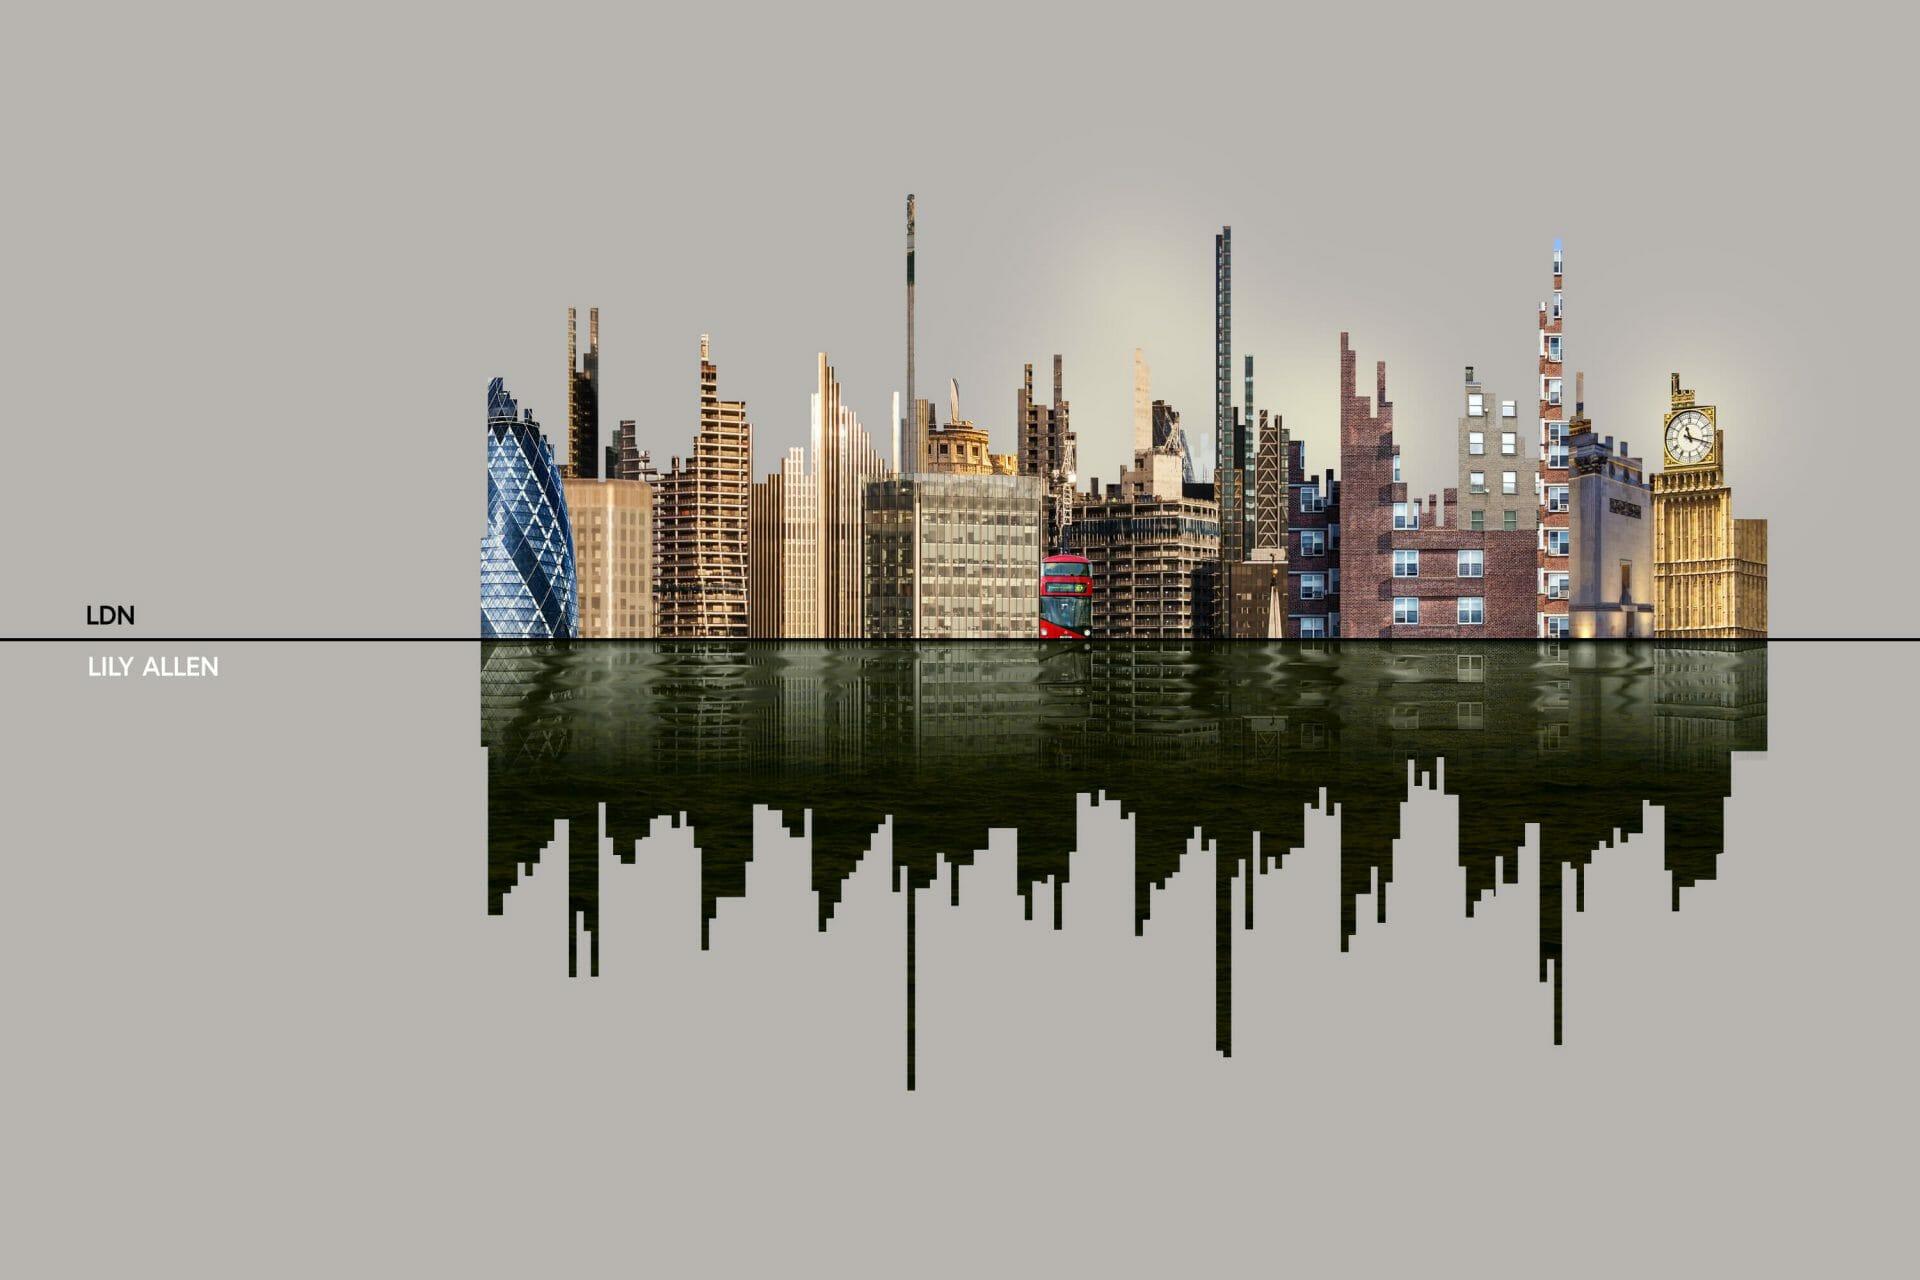 London waveform